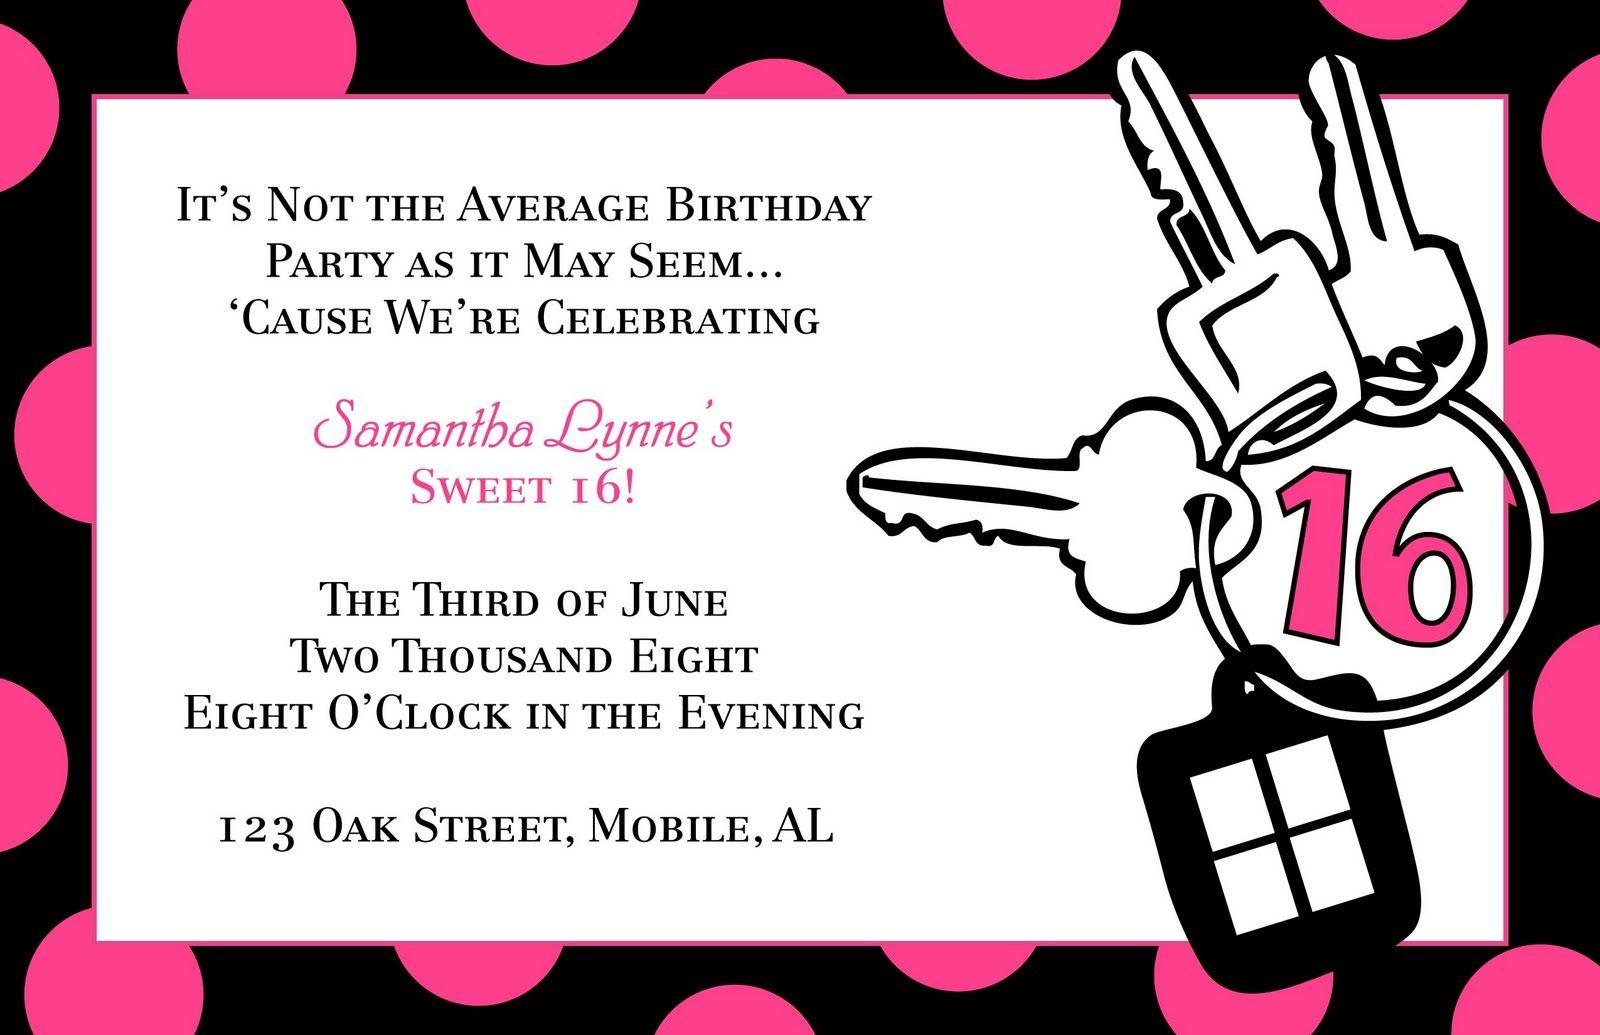 Teen birthday invitation templates it in style birthday teen birthday invitation templates it in style birthday adult filmwisefo Choice Image